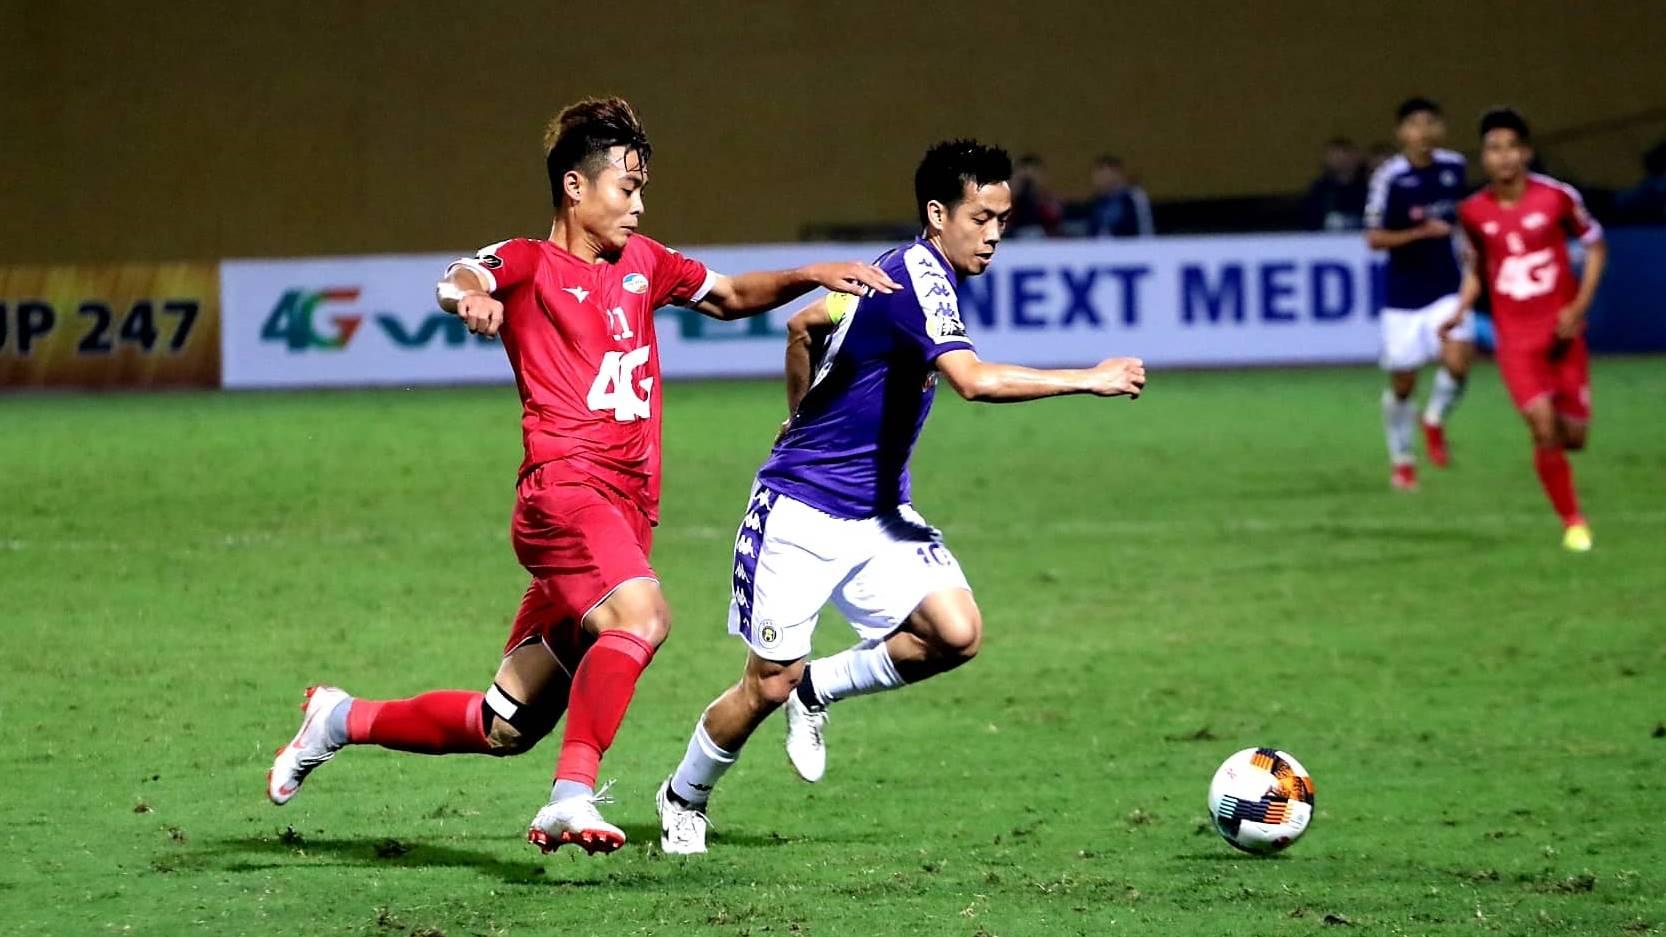 DIRECT FOOTBALL TV Viettel vs Hanoi FC  Live football today